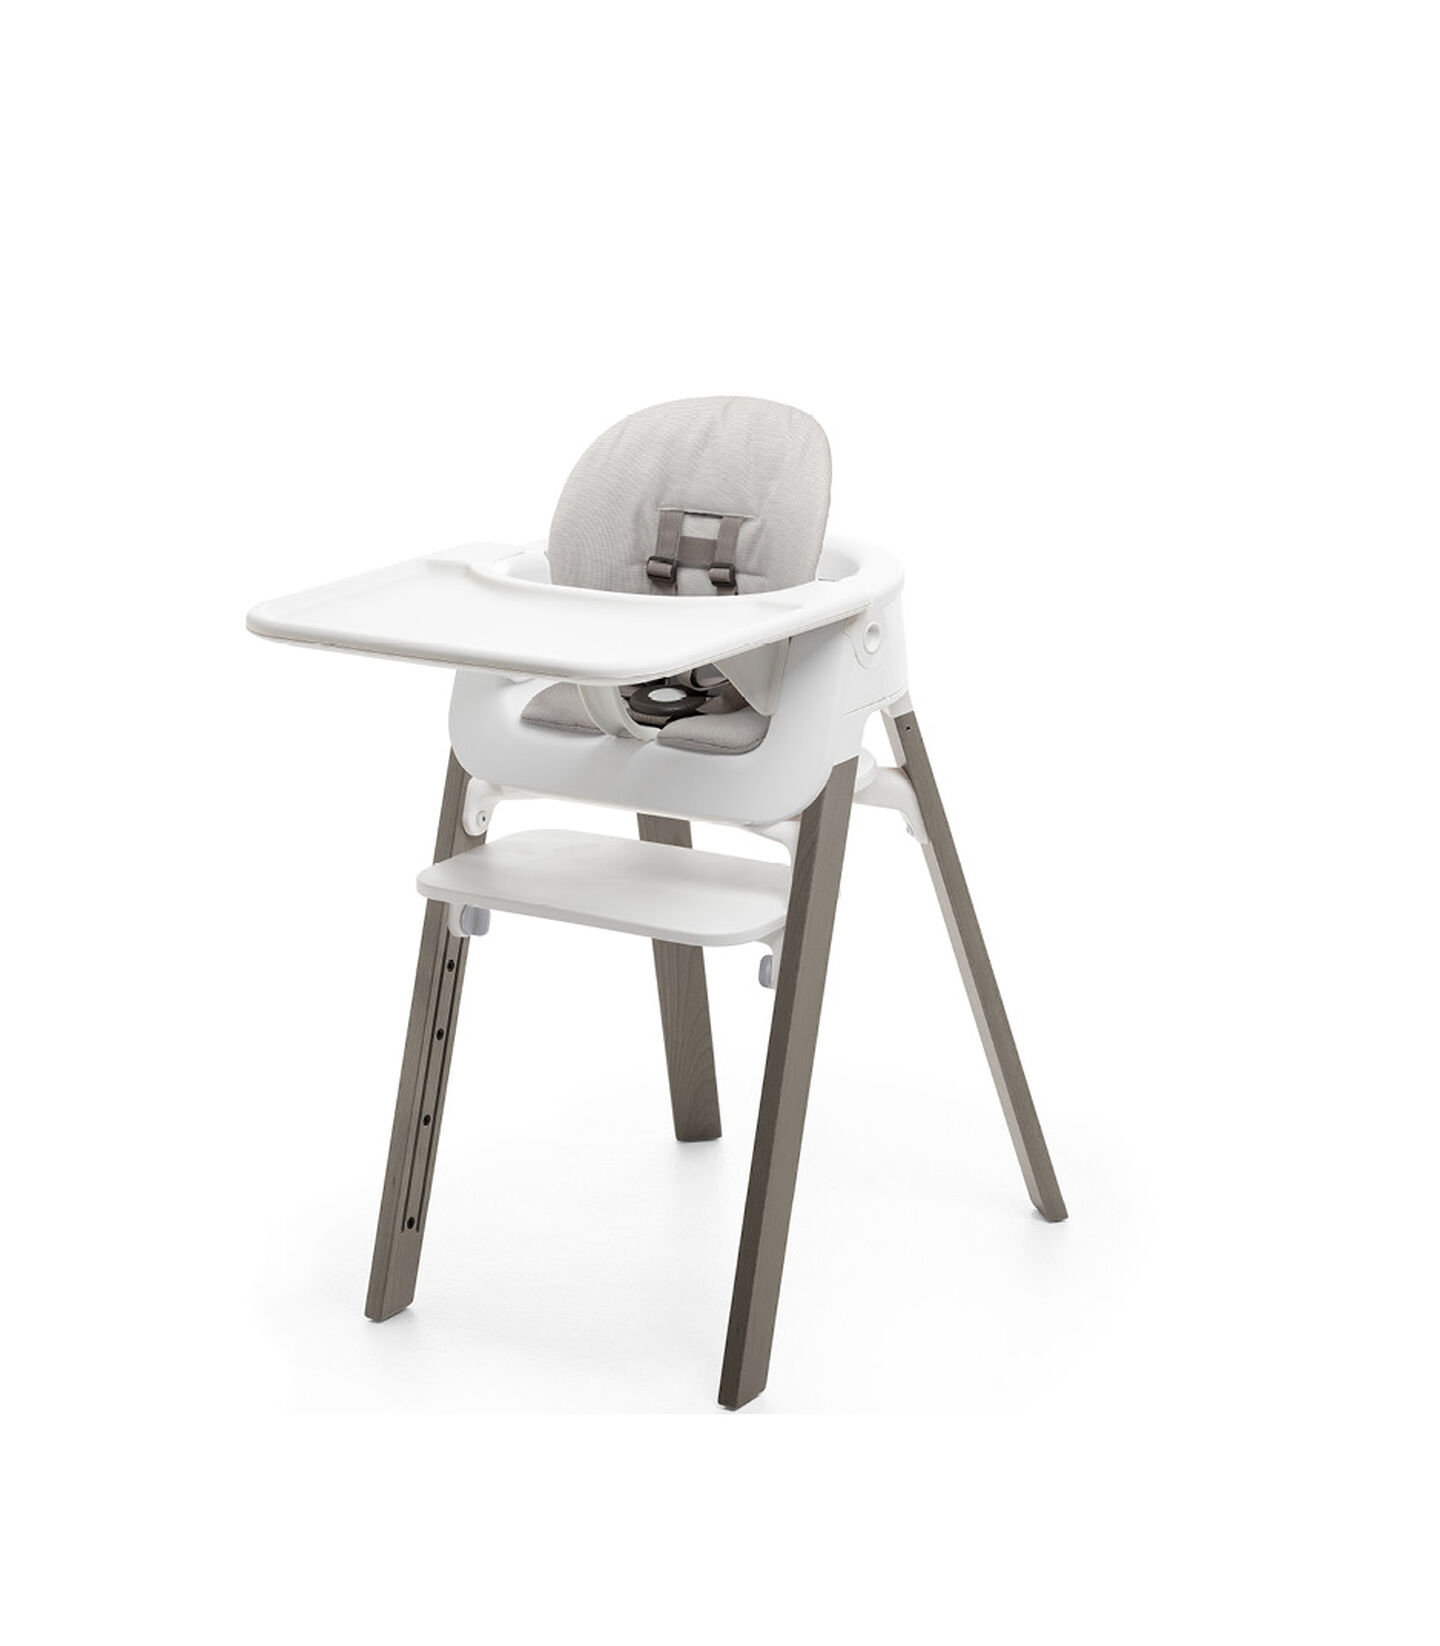 Stokke® Steps™ HC Complete Bundle Hazy w White Grey Cushion, White Seat BS-HazyGrey Legs, mainview view 1